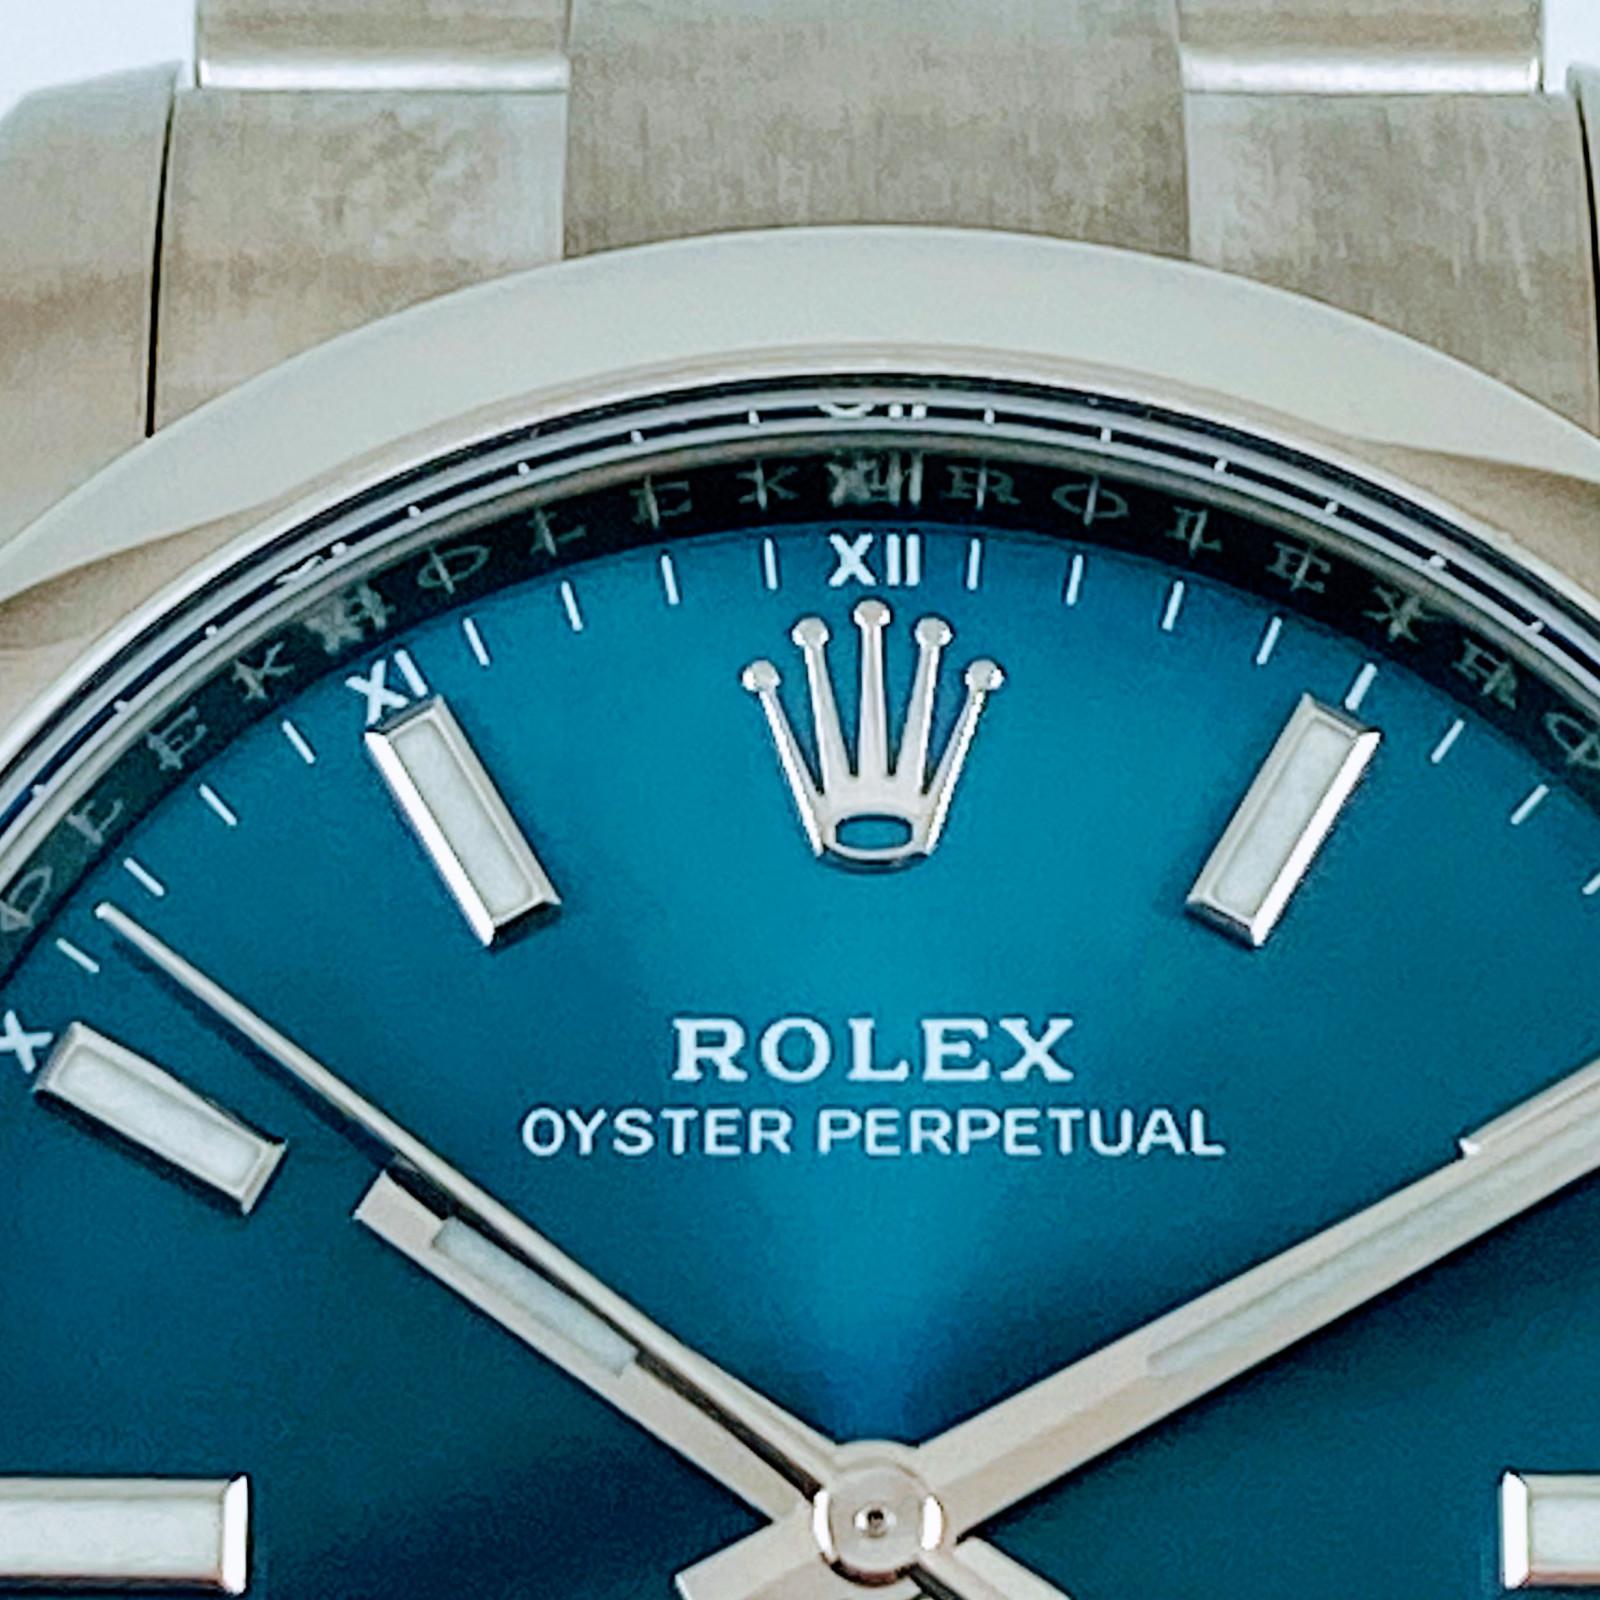 Unworn Rolex 124200 Oyster Perpetual 2021